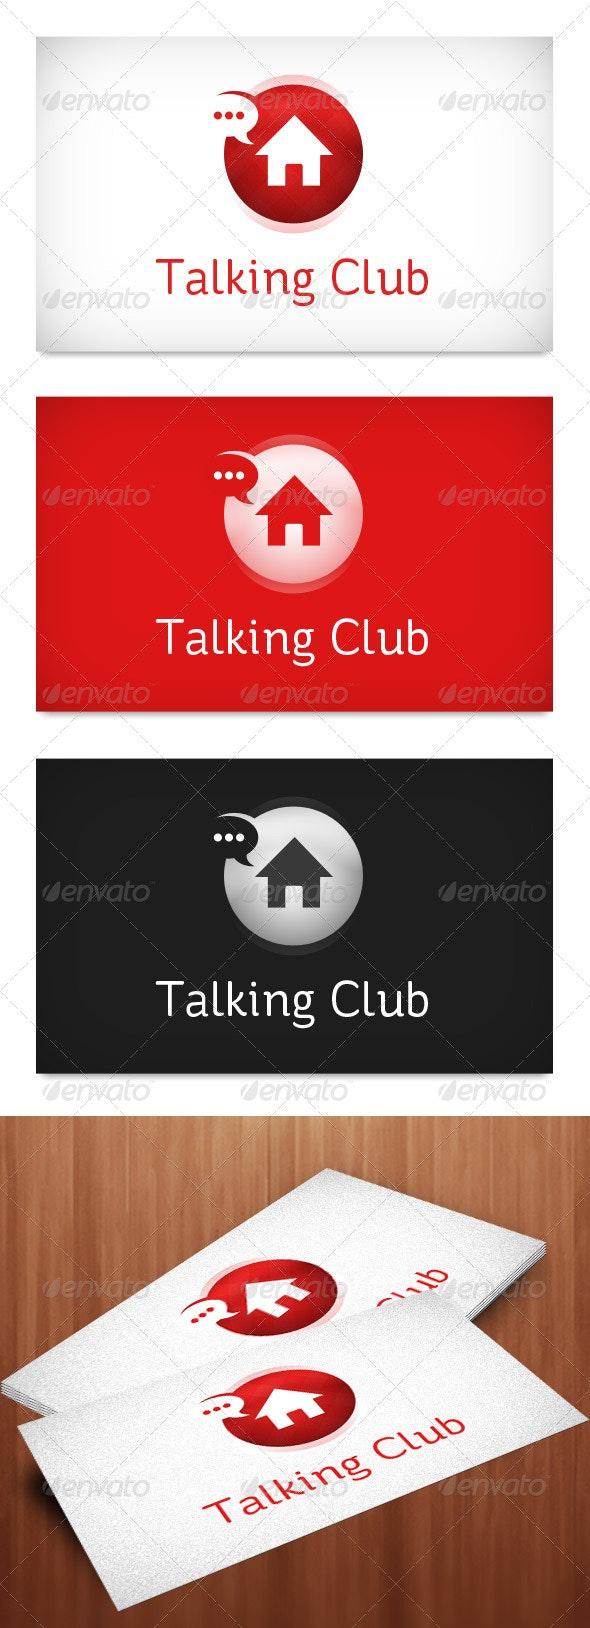 Talking Club Logo Template - Objects Logo Templates